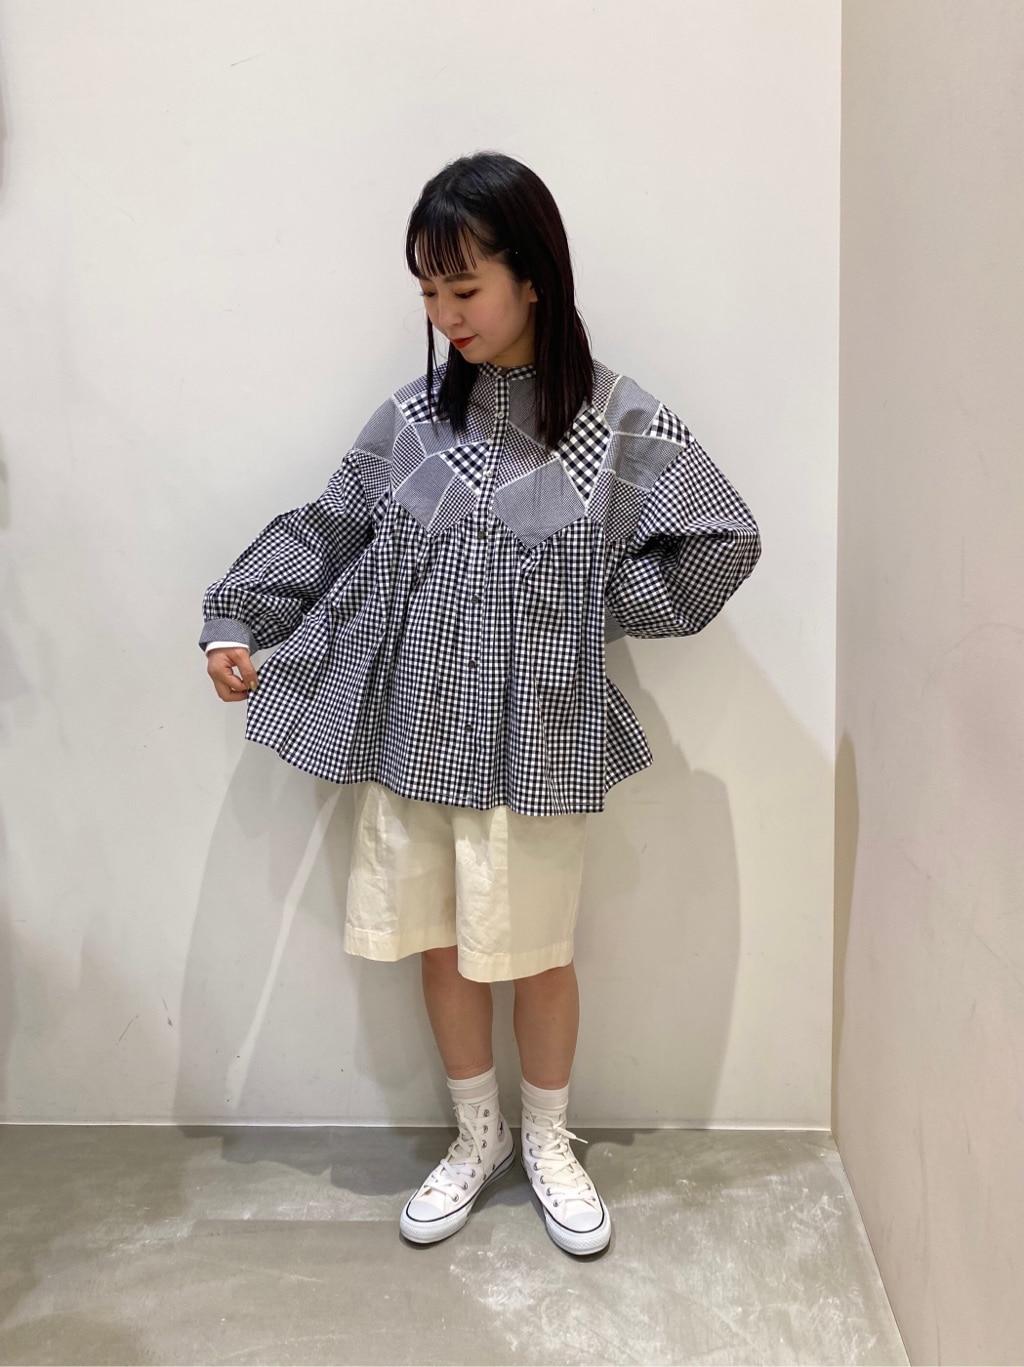 bulle de savon 阪急西宮ガーデンズ 身長:150cm 2020.06.09